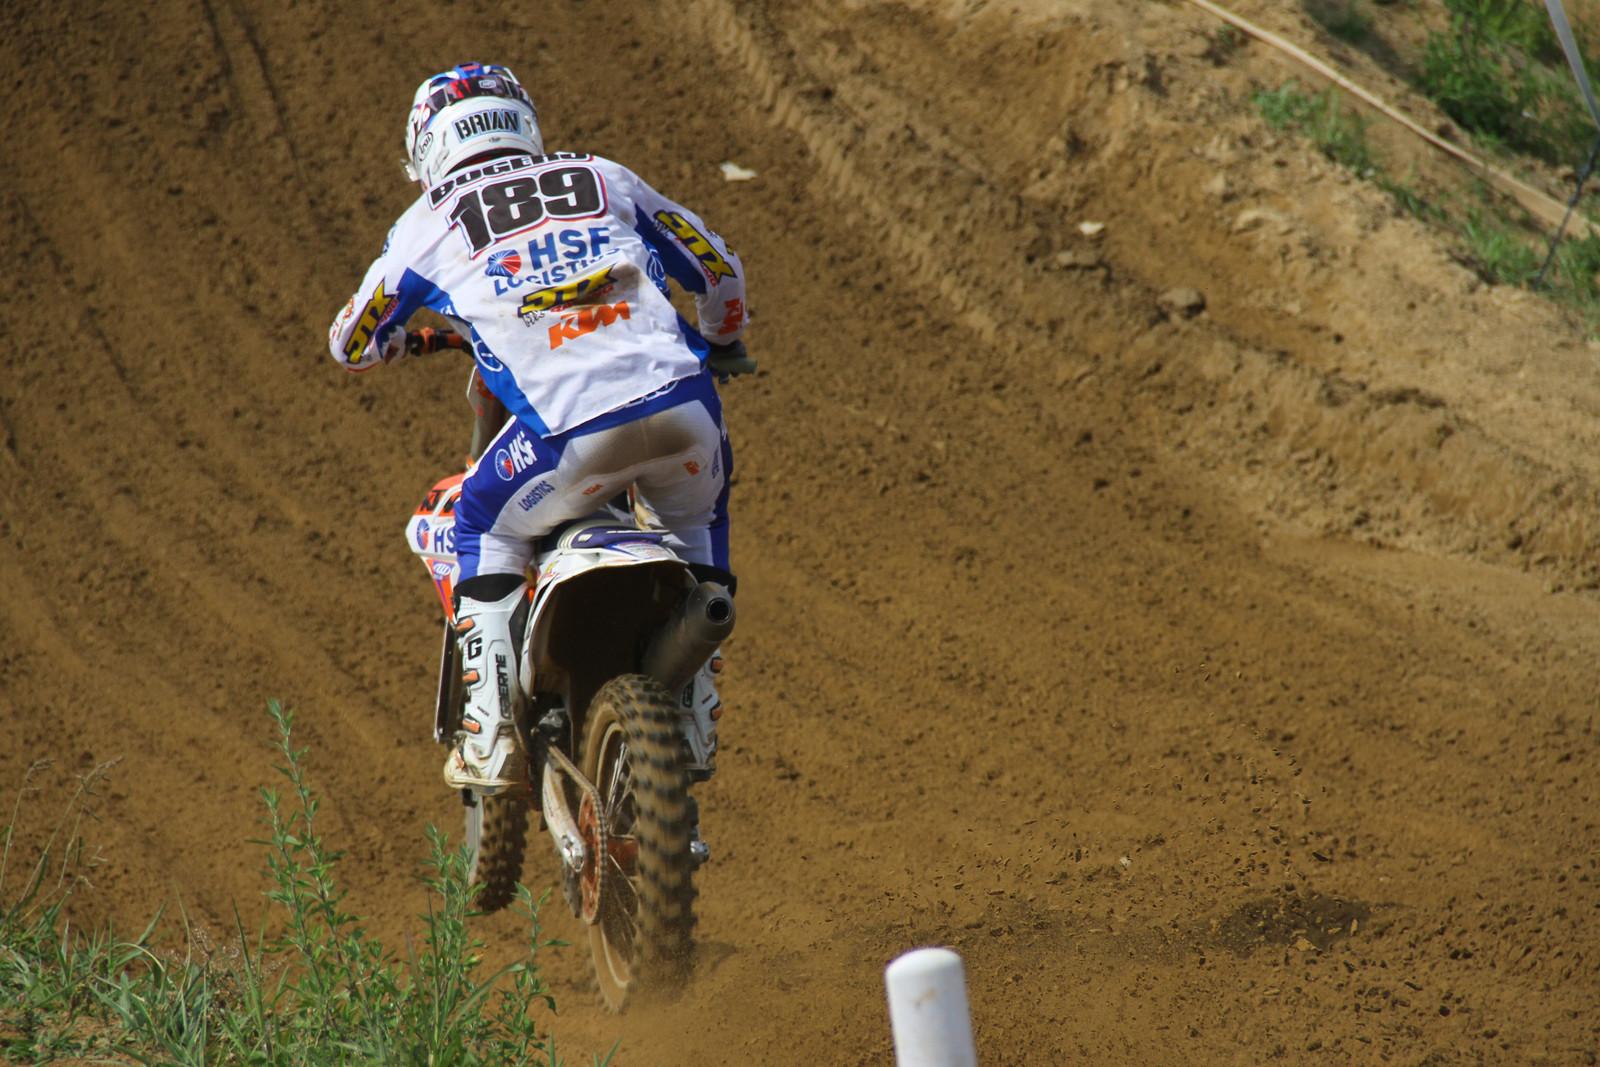 Brian Bogers - ayearinmx - Motocross Pictures - Vital MX